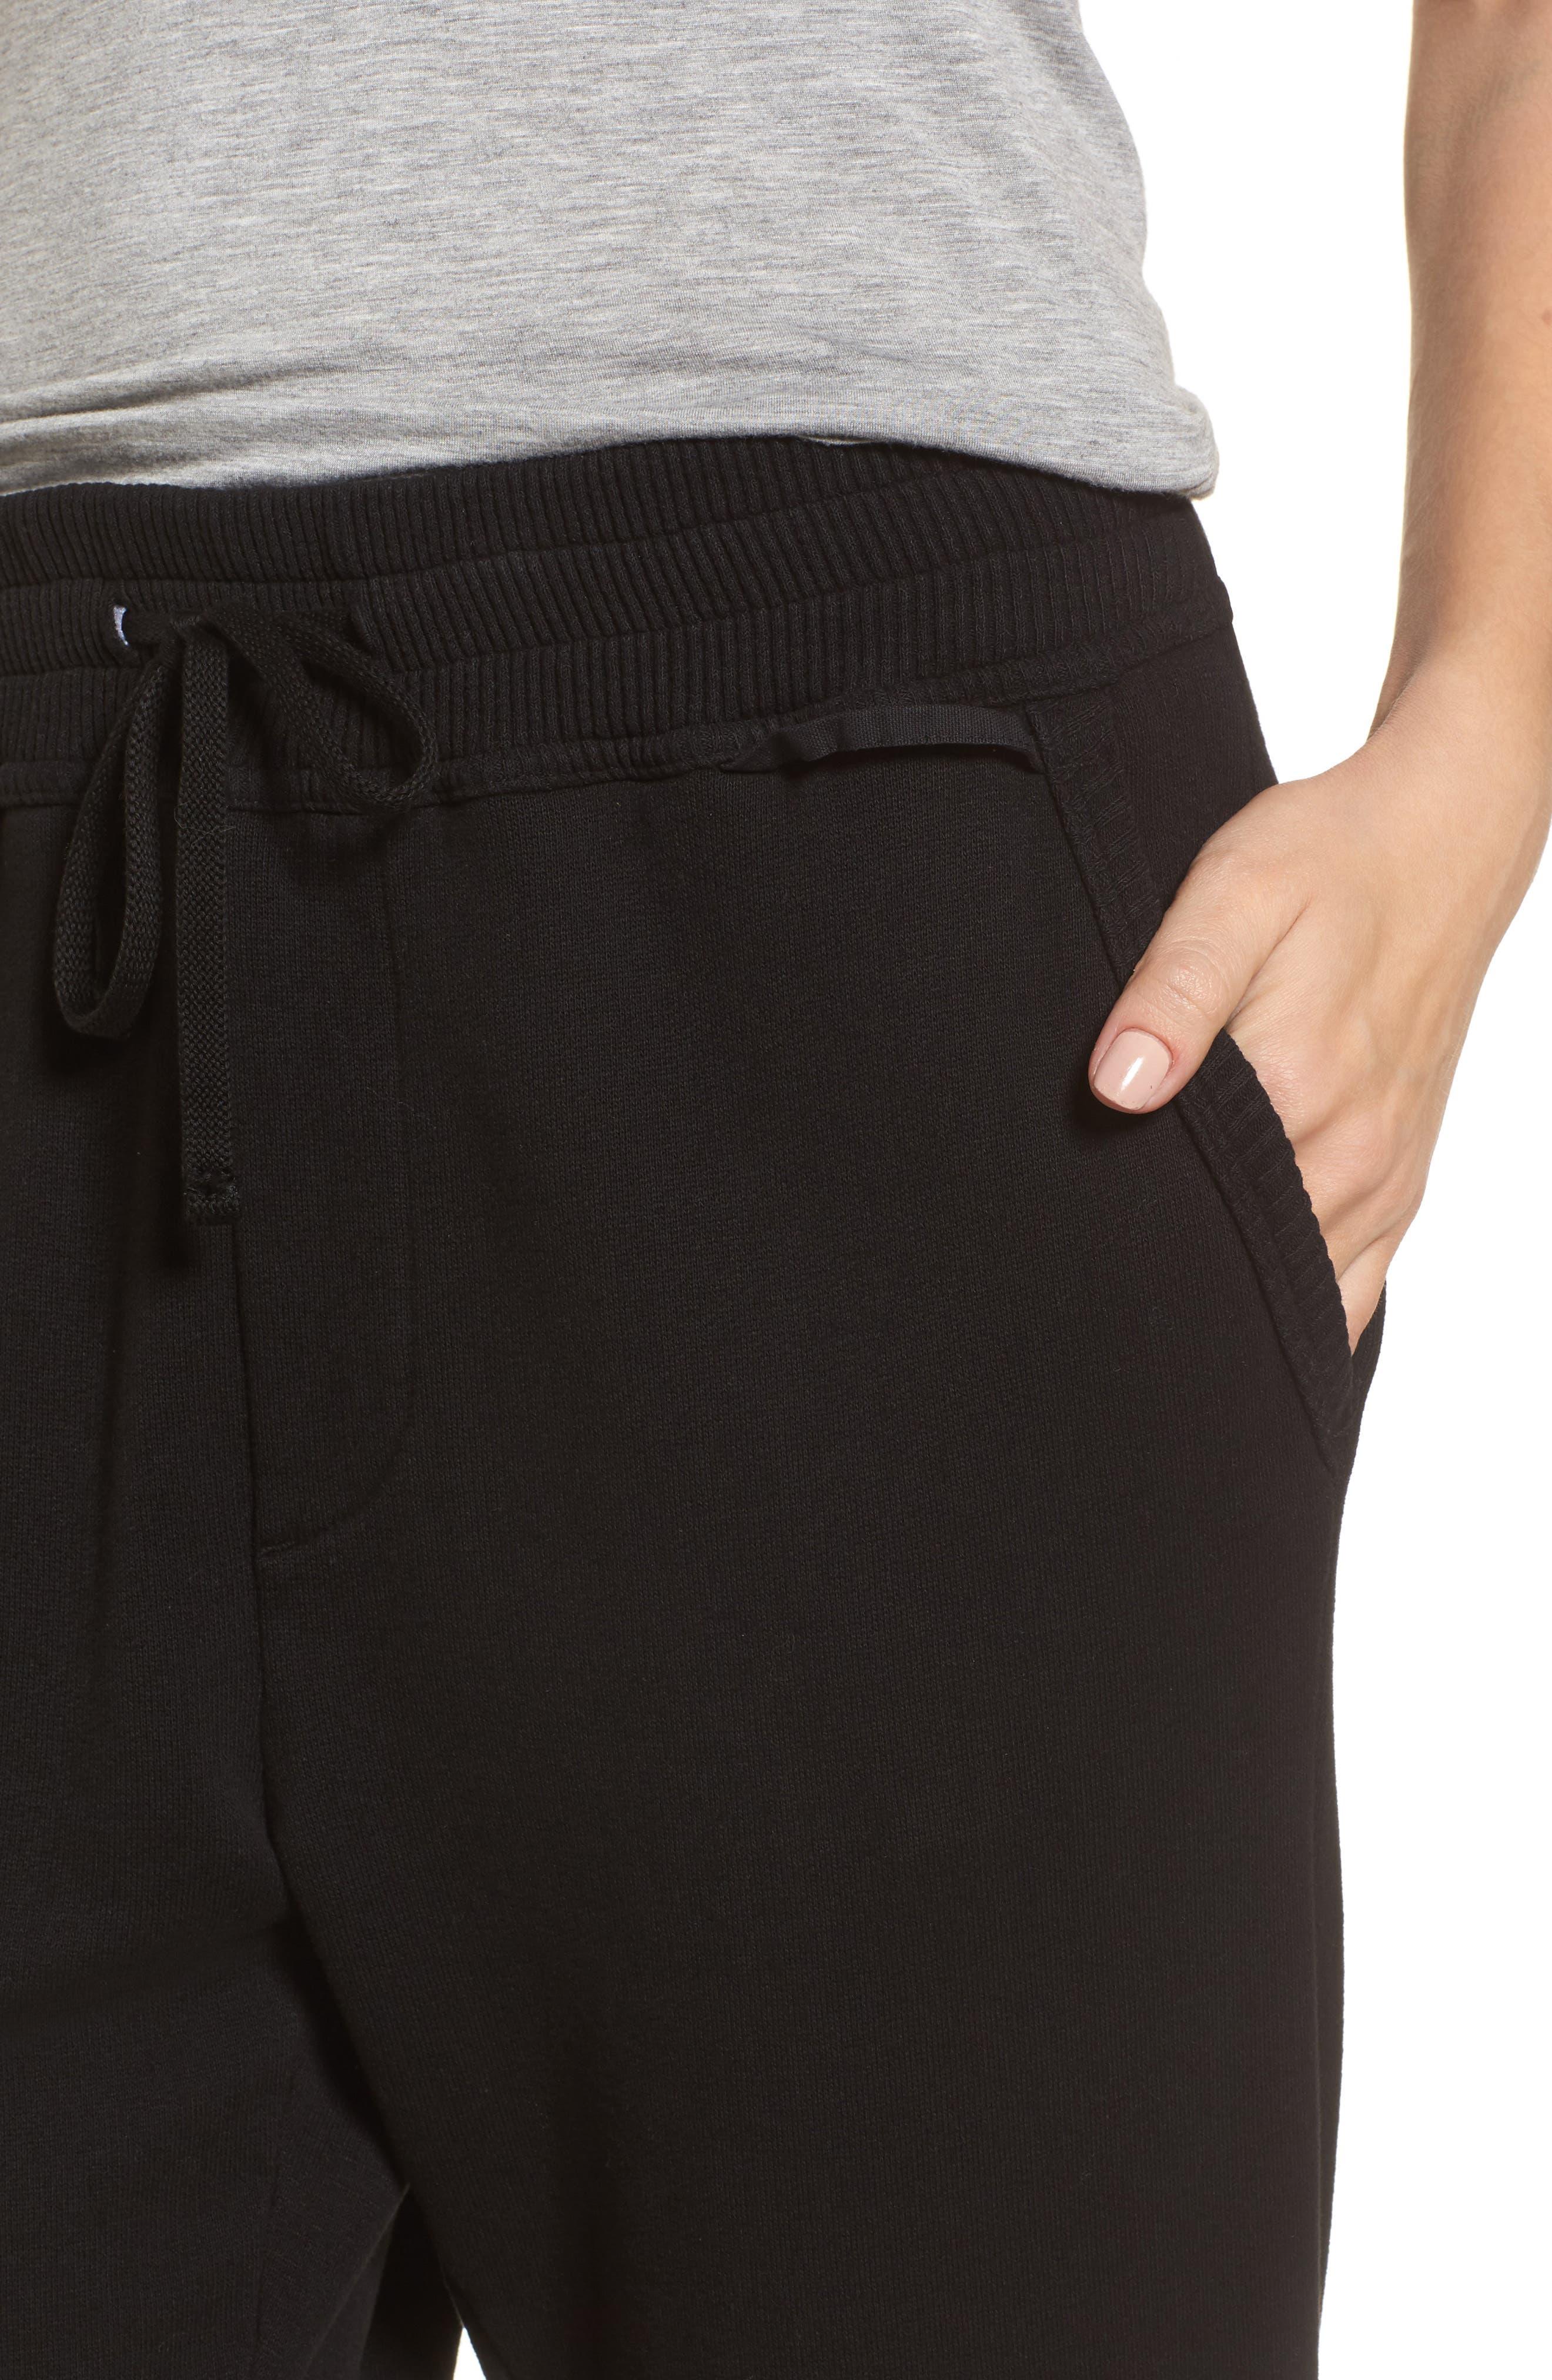 Terry Lounge Pants,                             Alternate thumbnail 4, color,                             Black